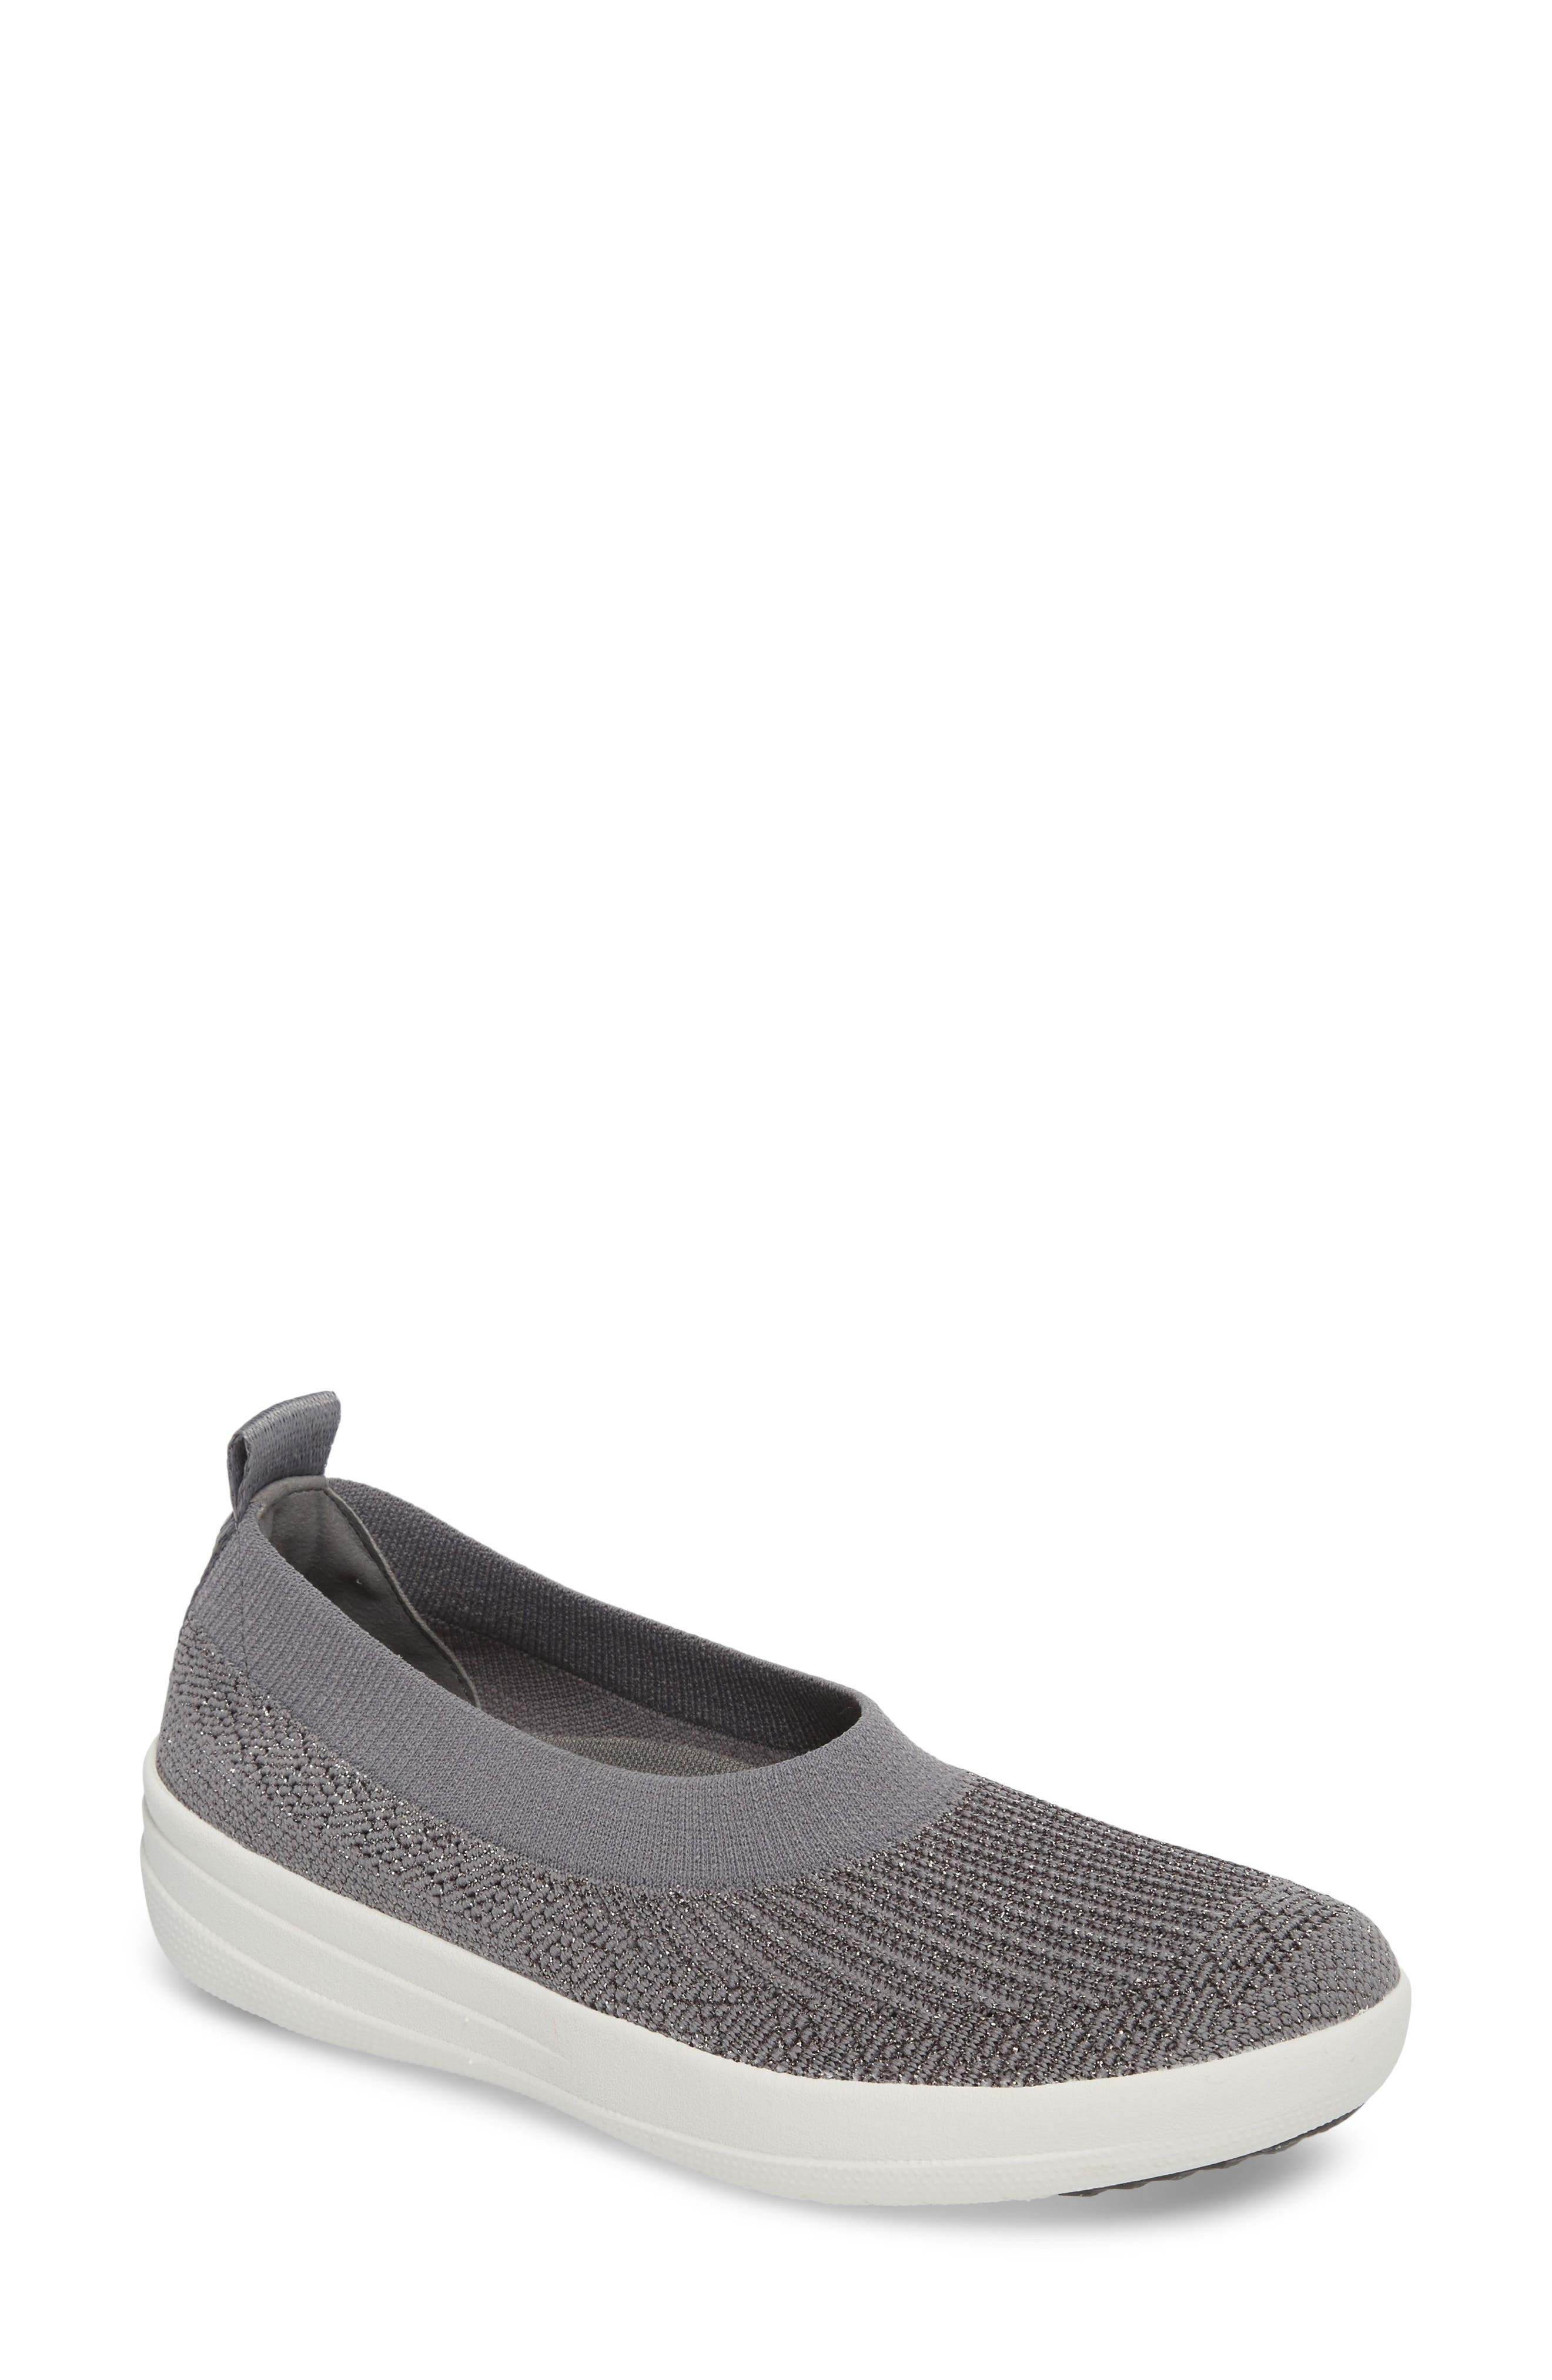 Uberknit<sup>™</sup> Slip-On Ballerina Sneaker,                             Main thumbnail 1, color,                             Charcoal/ Metallic Pewter